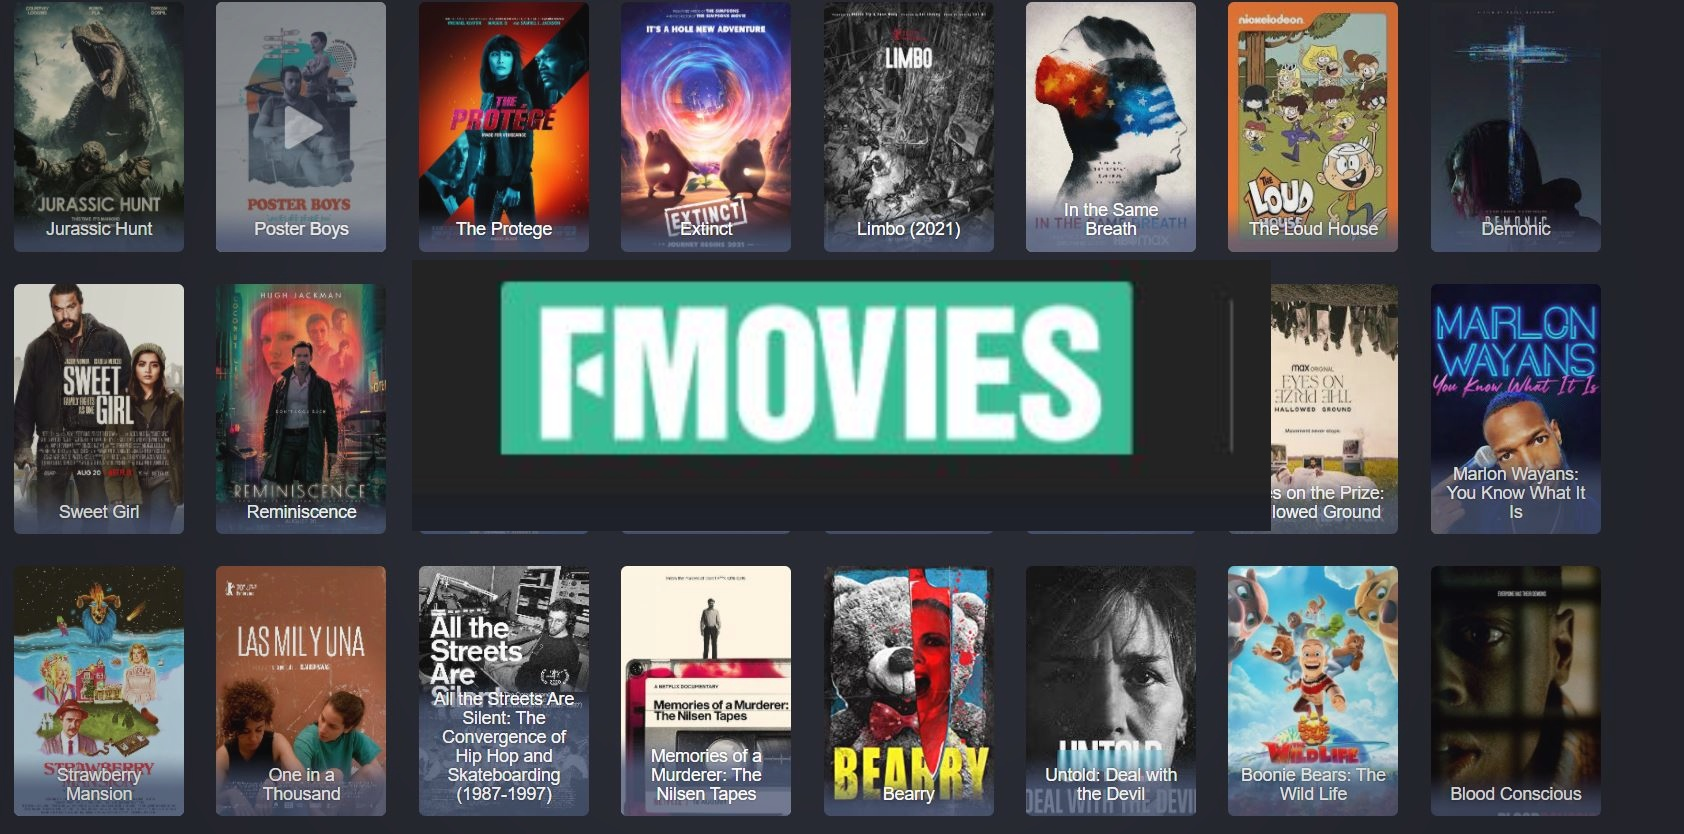 Fmovies Proxy   Unblocked Fmovies.to and Sites like Fmovies.io